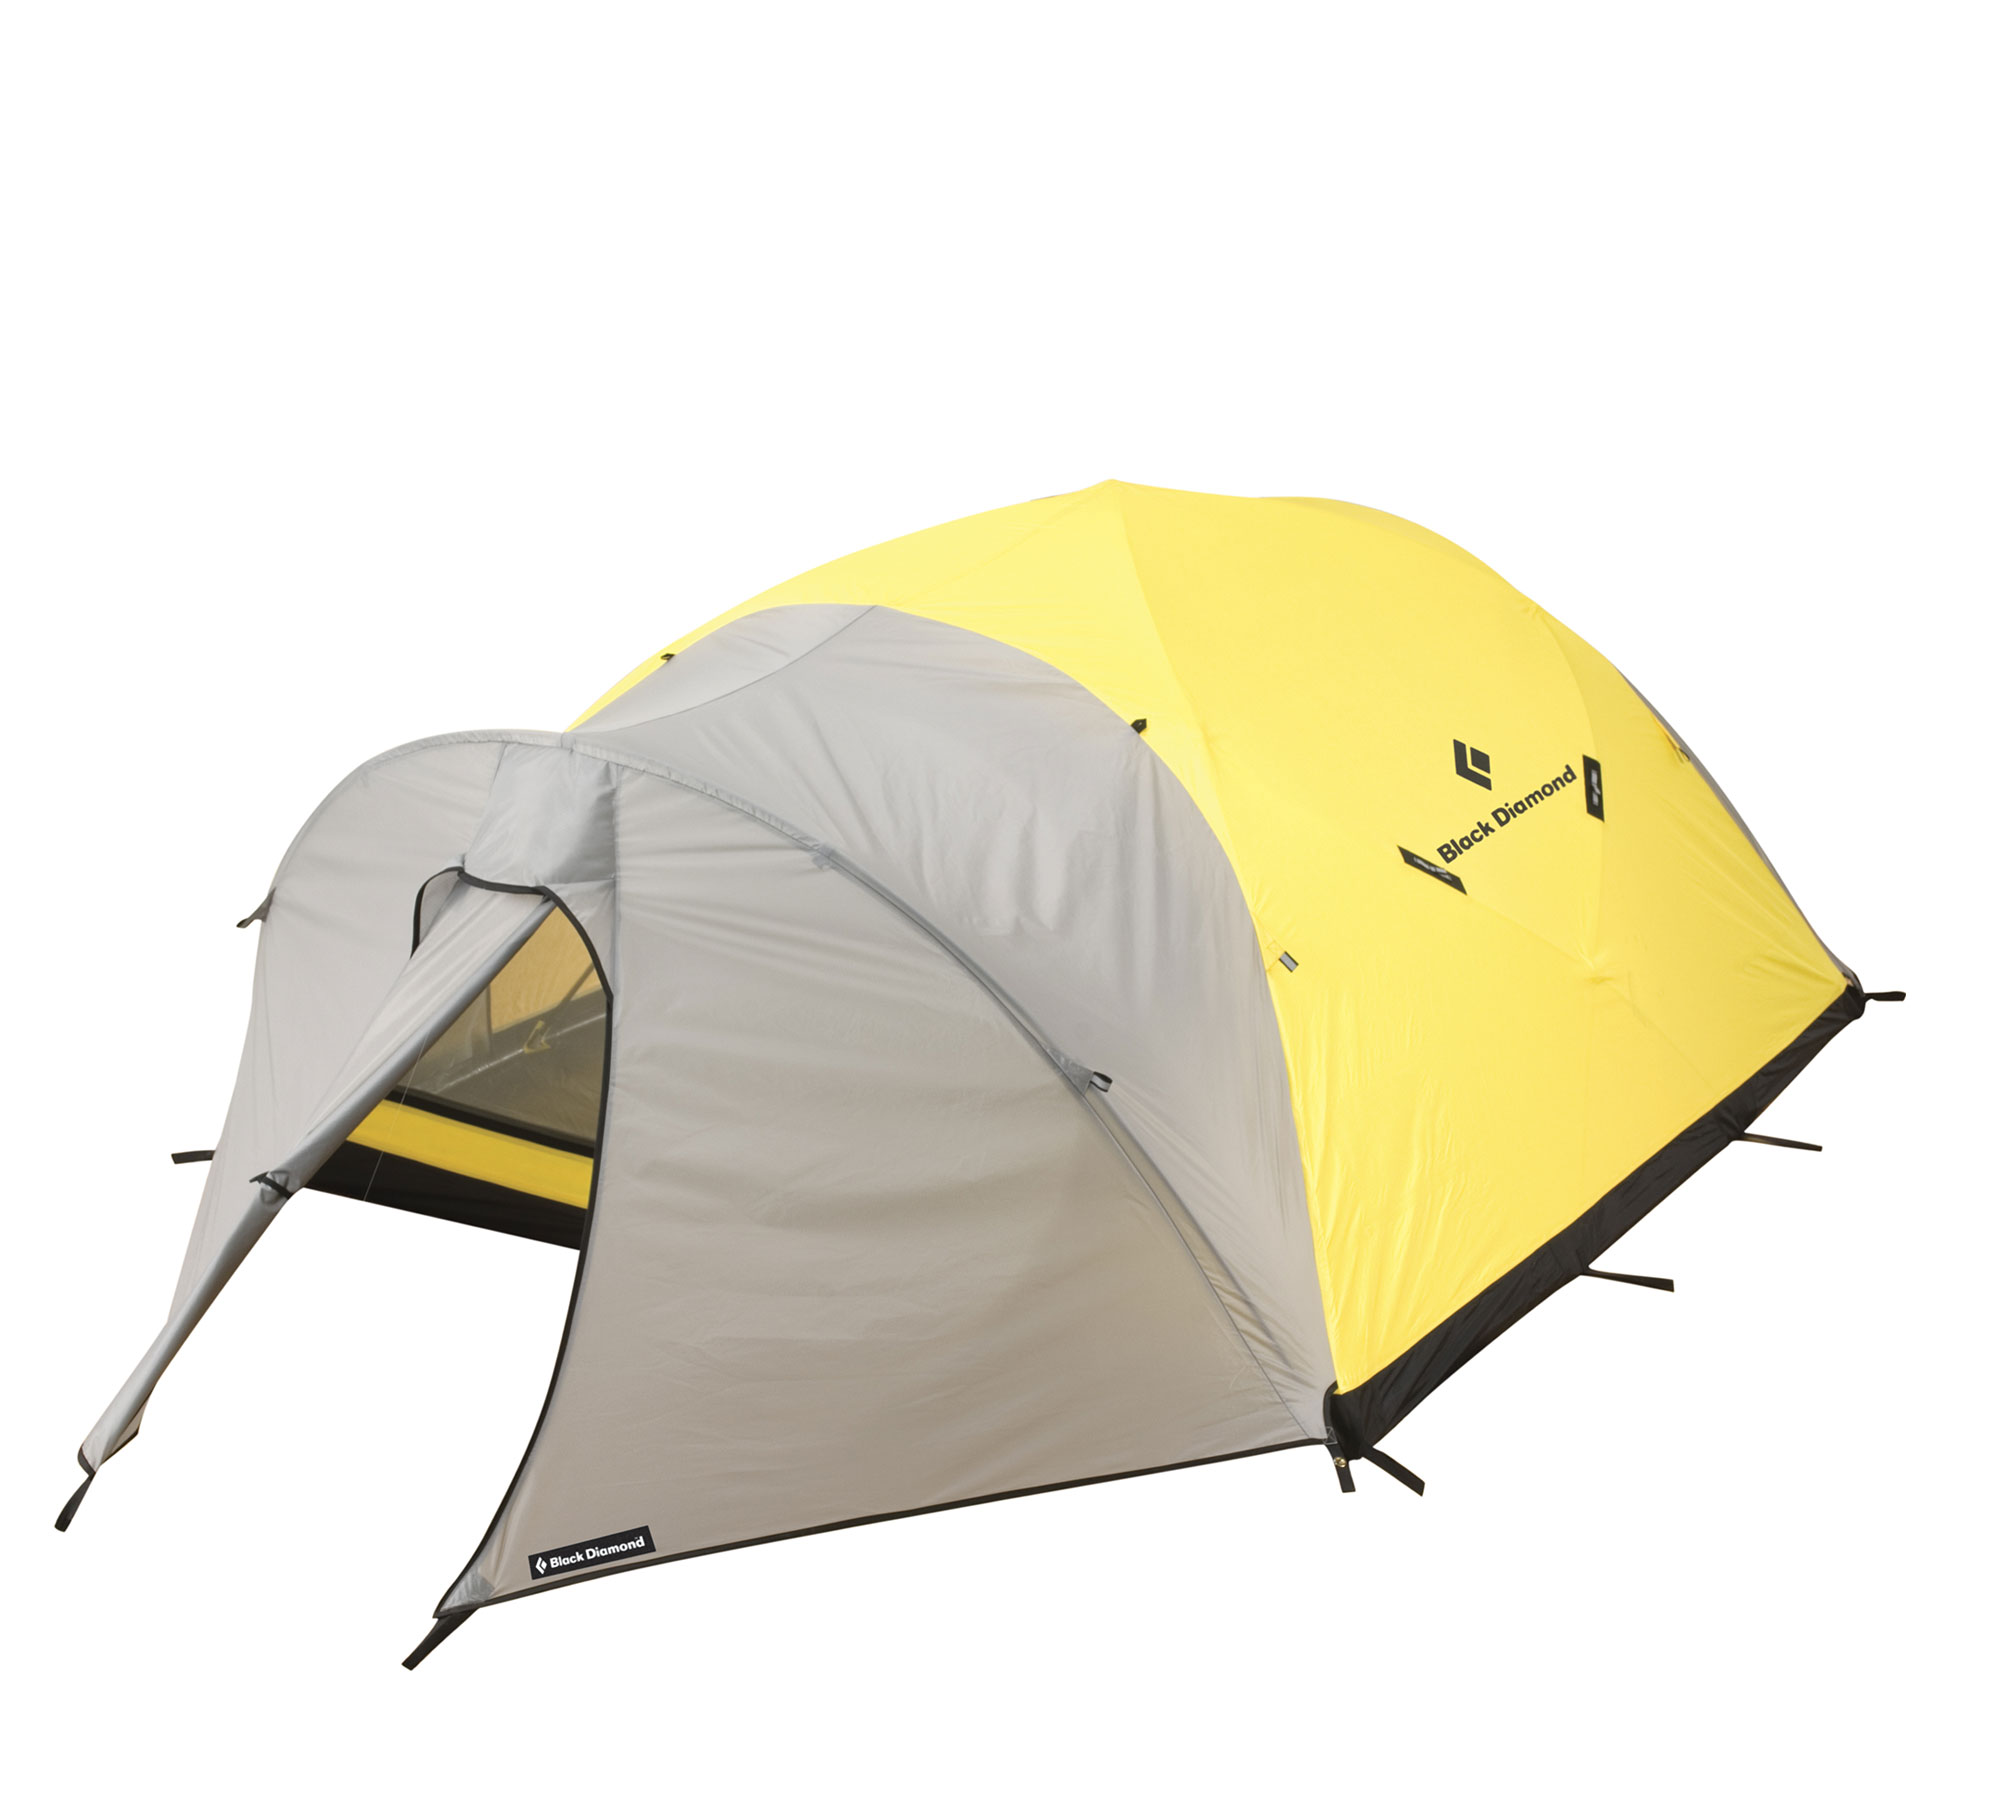 Black Diamond Bombshelter  sc 1 st  Tent Selector & Tents